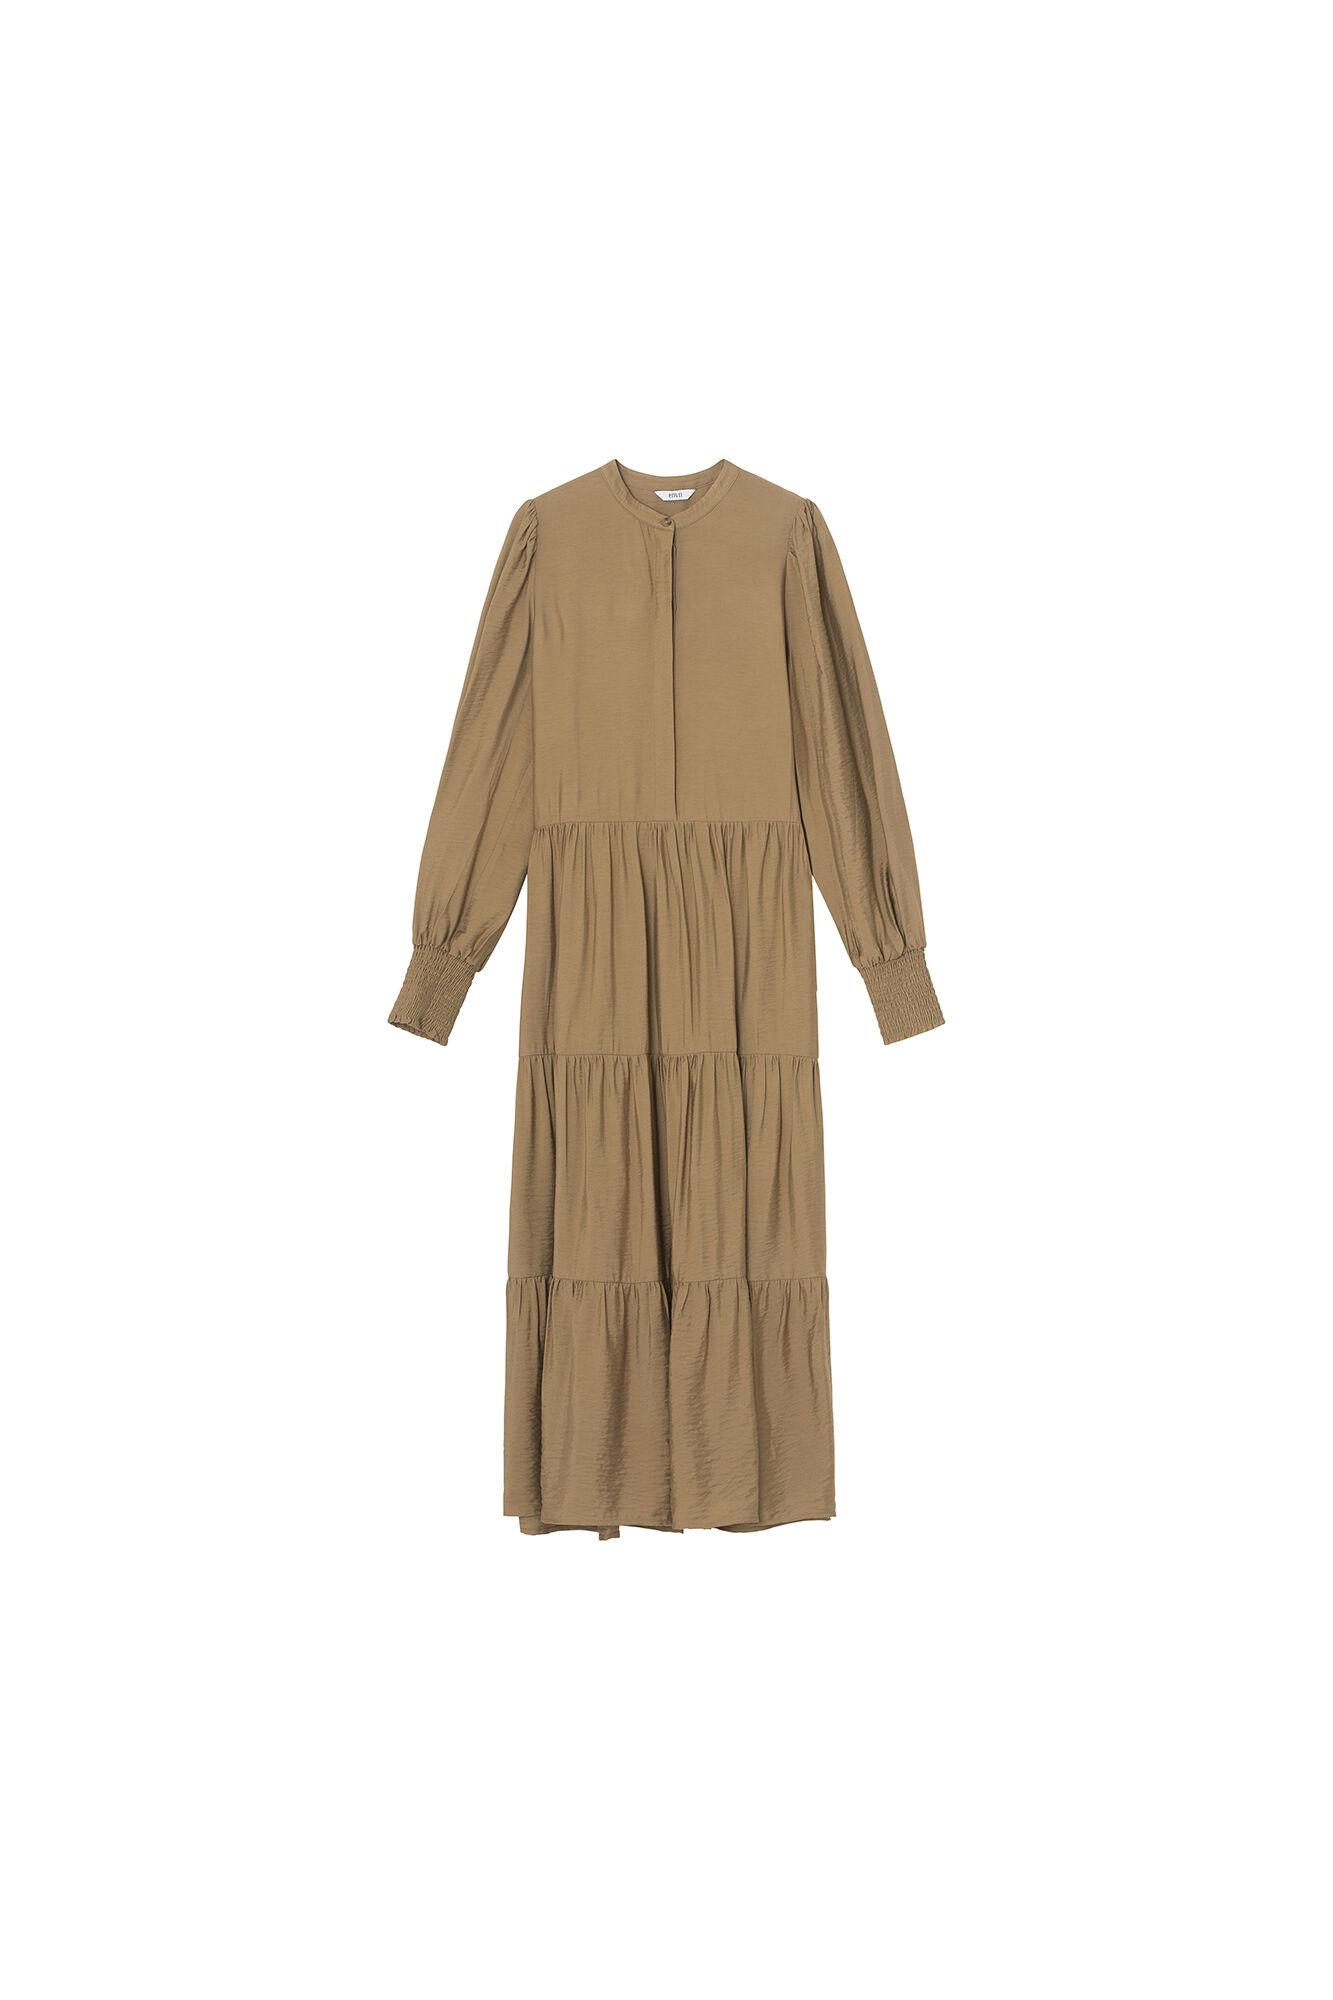 ENDOWNING LS MAXI DRESS, ERMINE